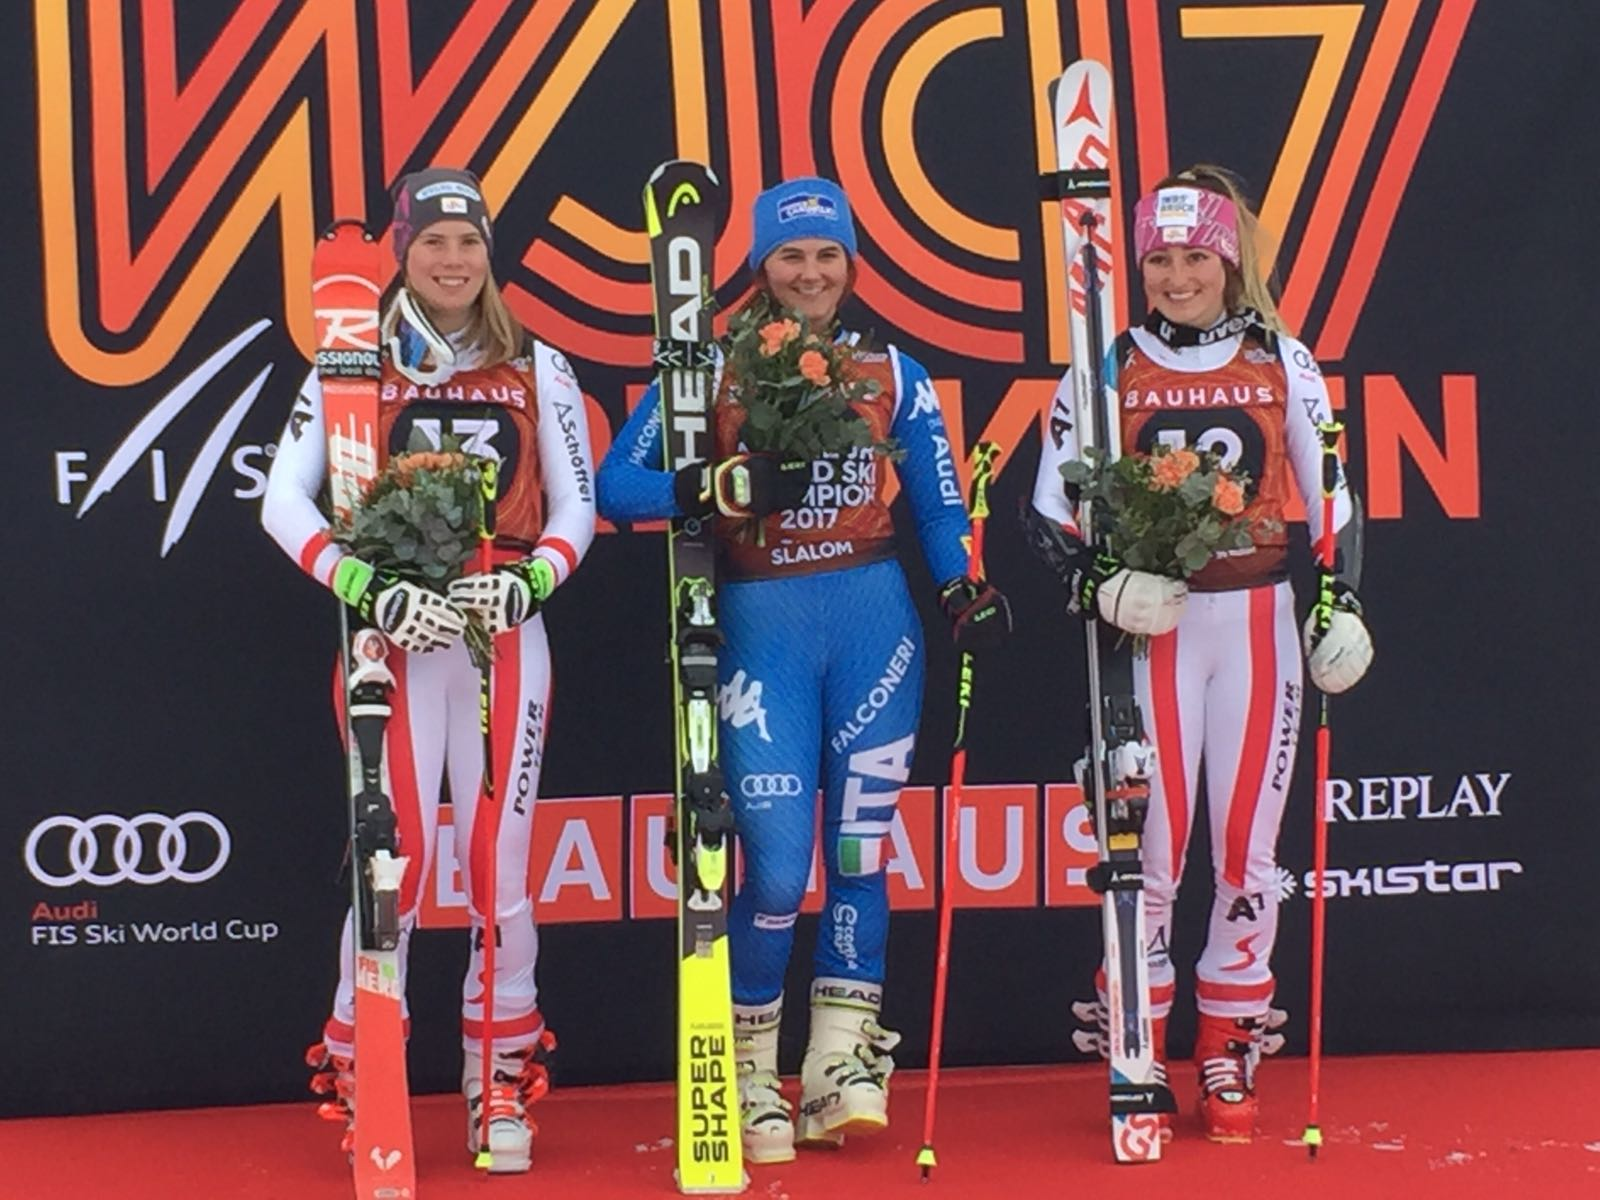 Katharina Liensberger, Laura Pirovano e Chiara Mair sul podio del gigante ai Mondiali jr. di Aare 2017